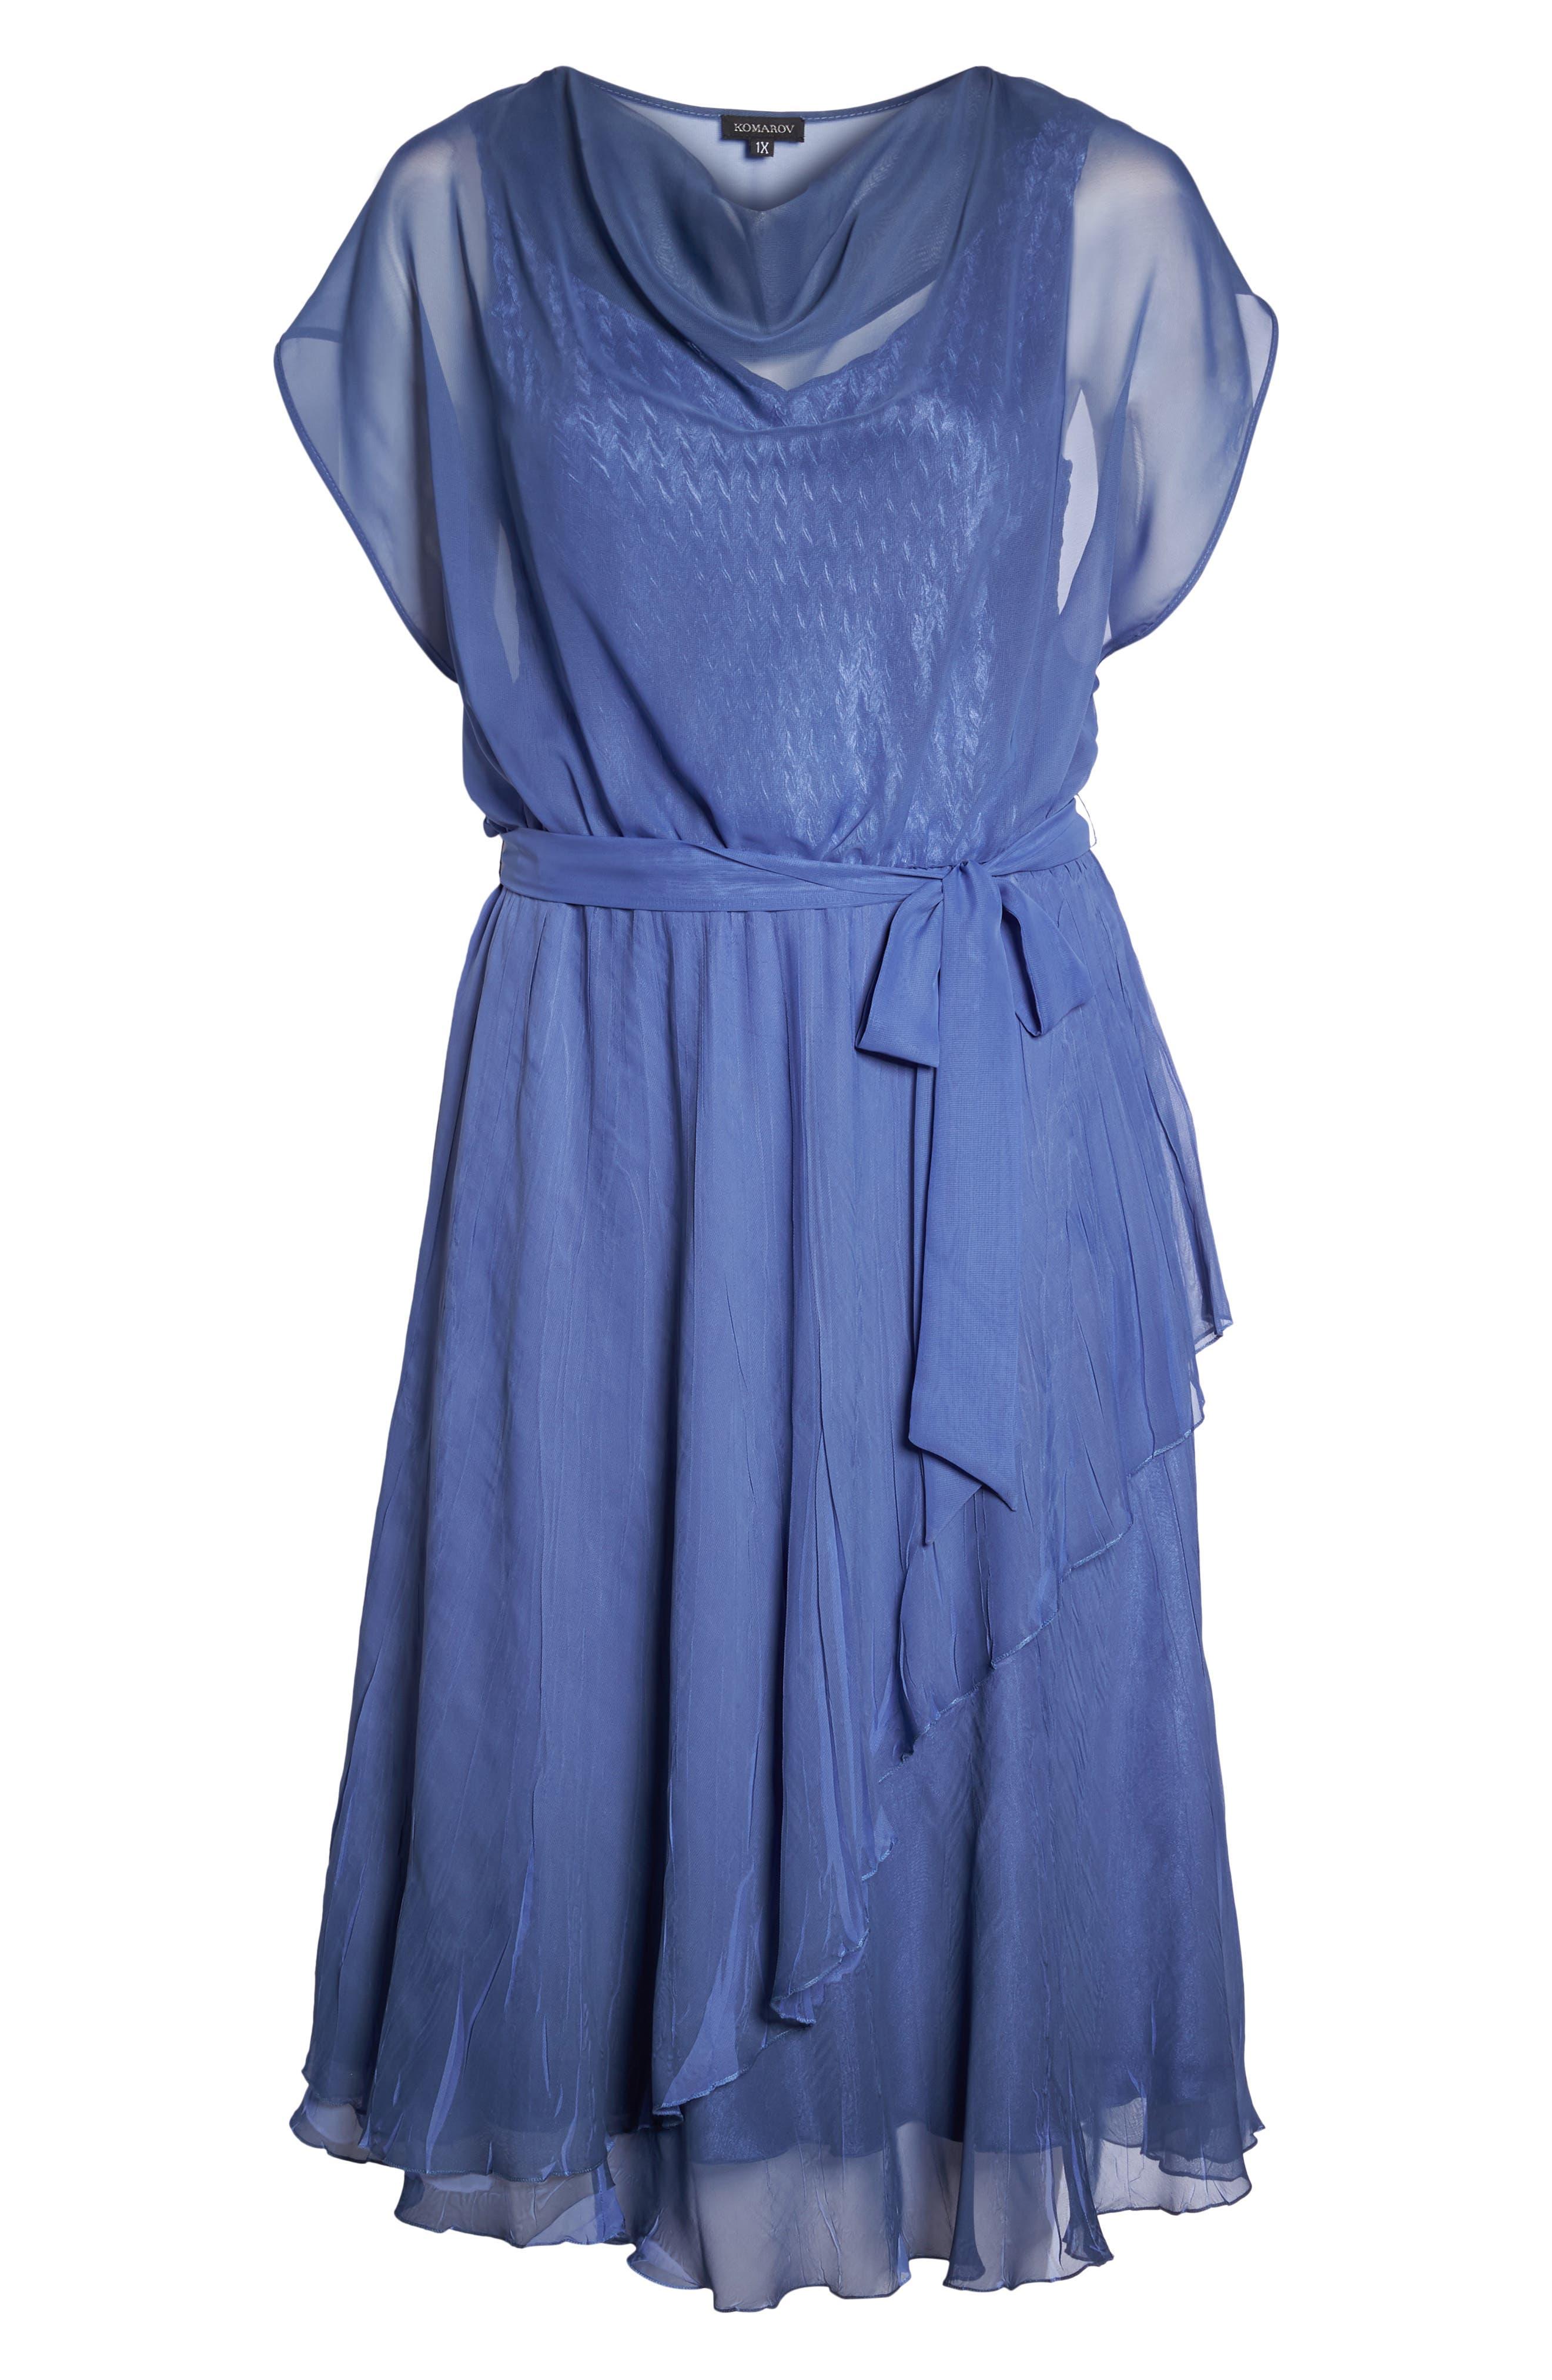 Charmeuse & Chiffon Blouson Dress,                             Alternate thumbnail 7, color,                             Fregatta Blue Ombre